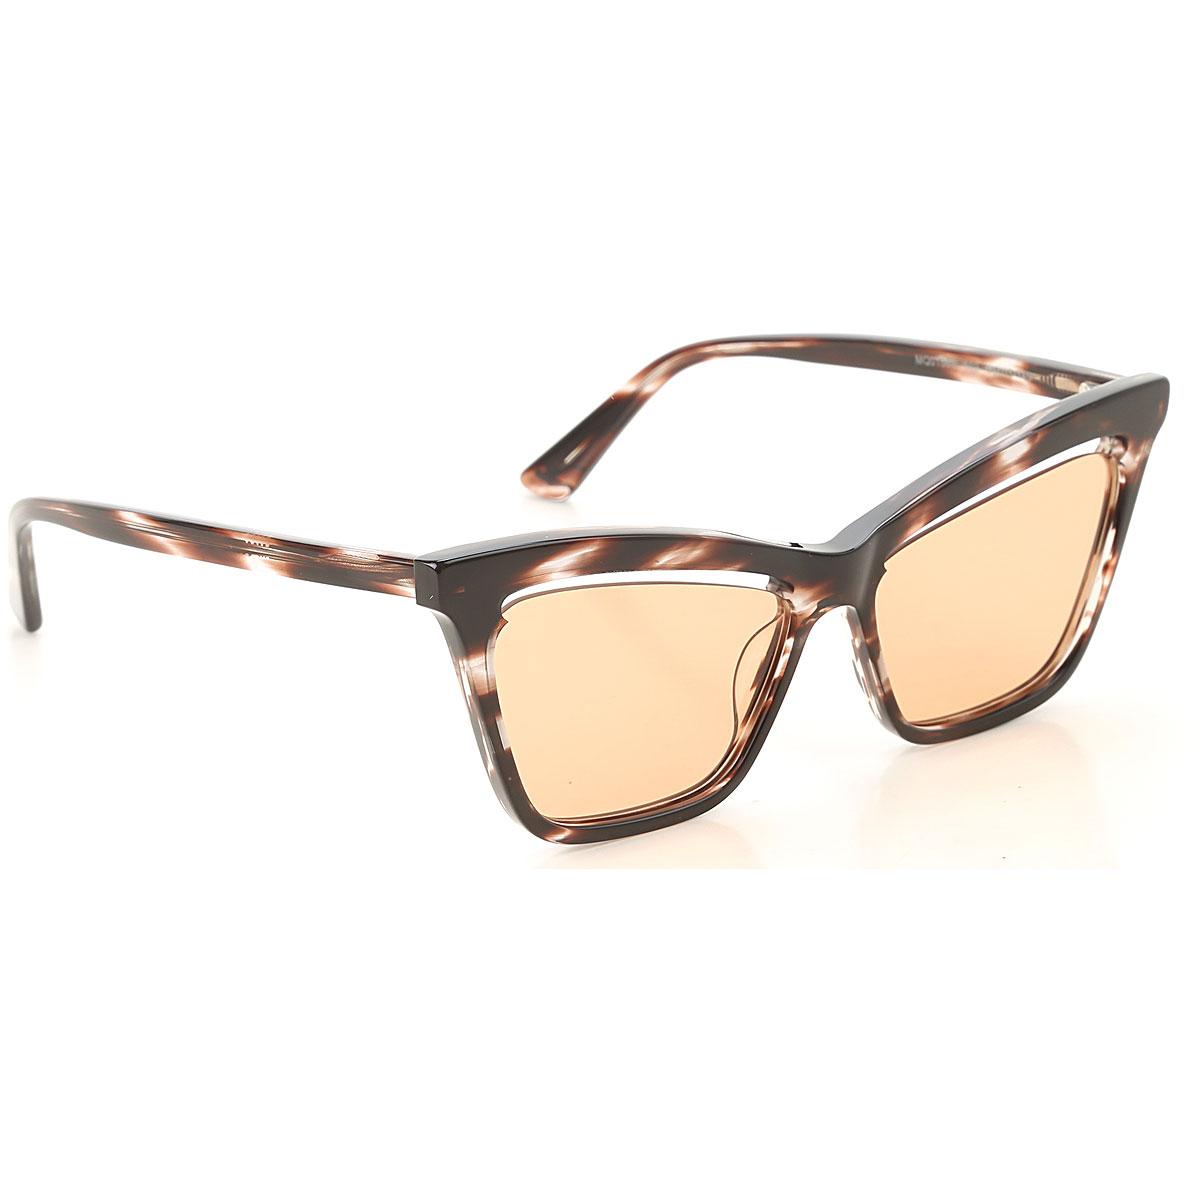 Alexander McQueen McQ Sunglasses On Sale, Burgundy, 2019